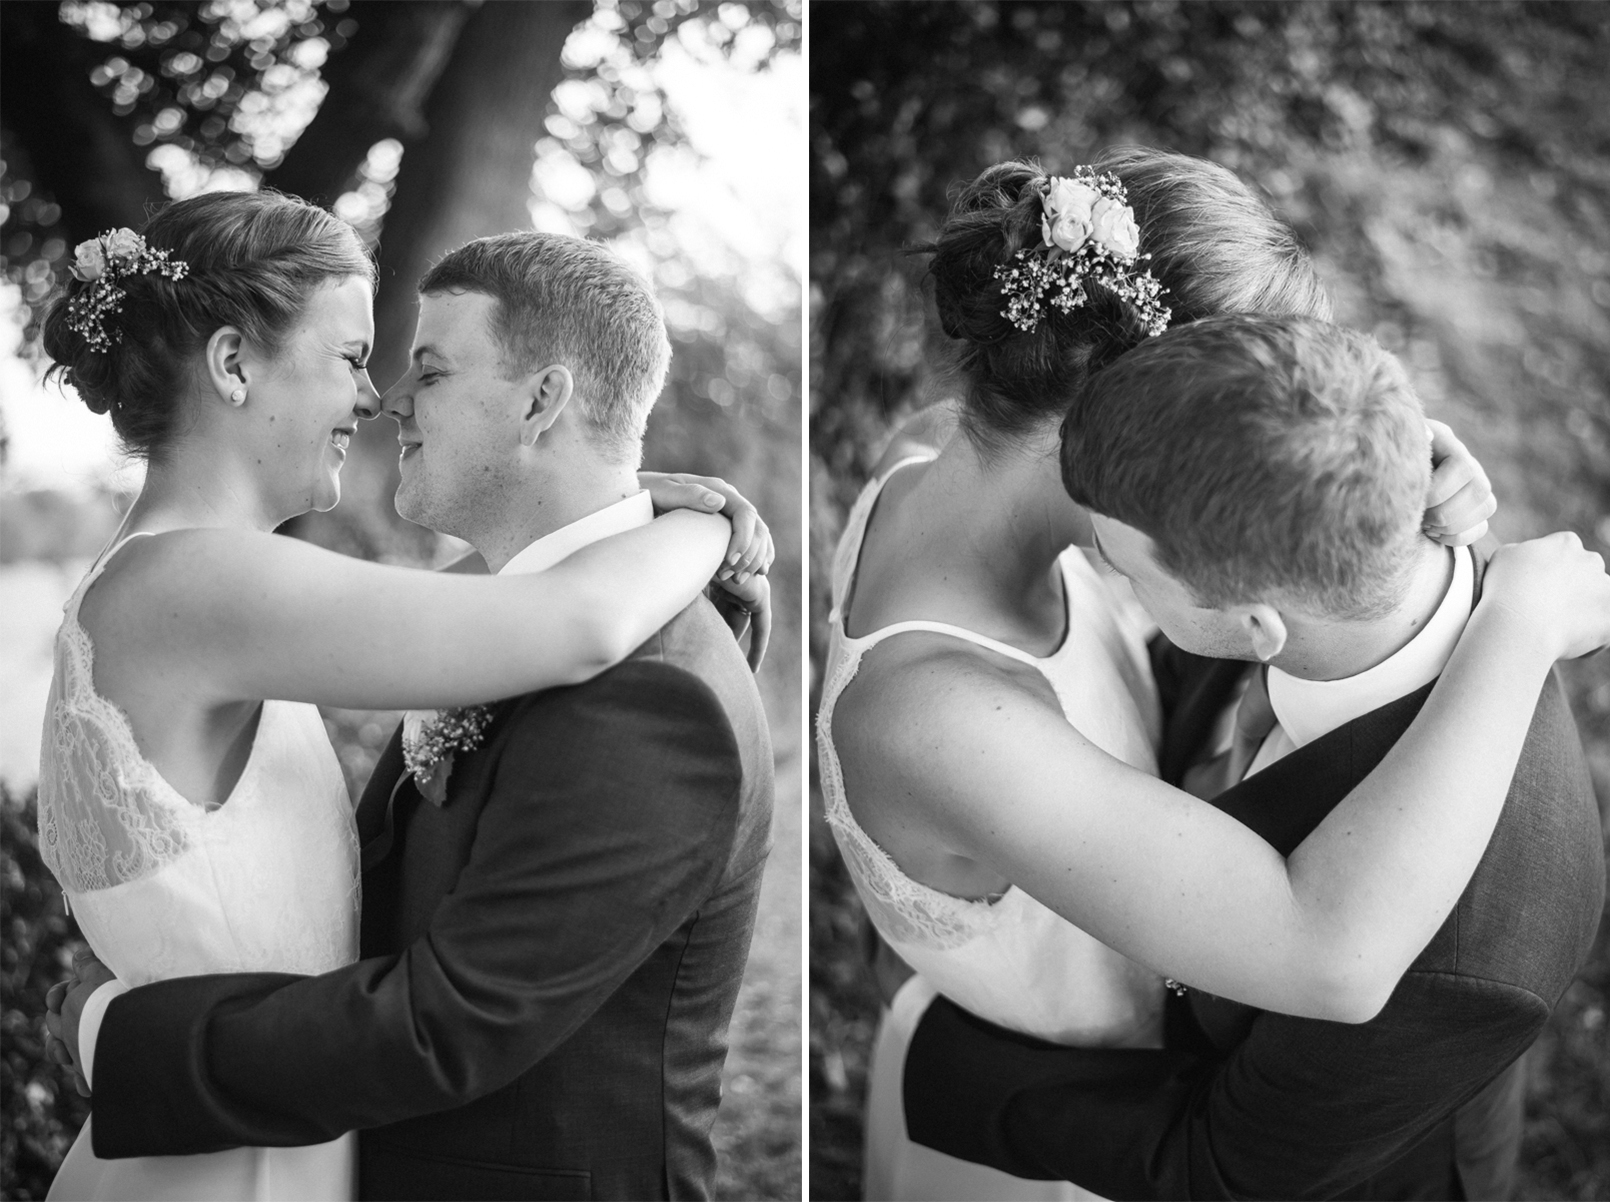 Hochzeitsfotograf-Fotografie-Aachen-Lua-Pauline-Dreamcatcher-0053